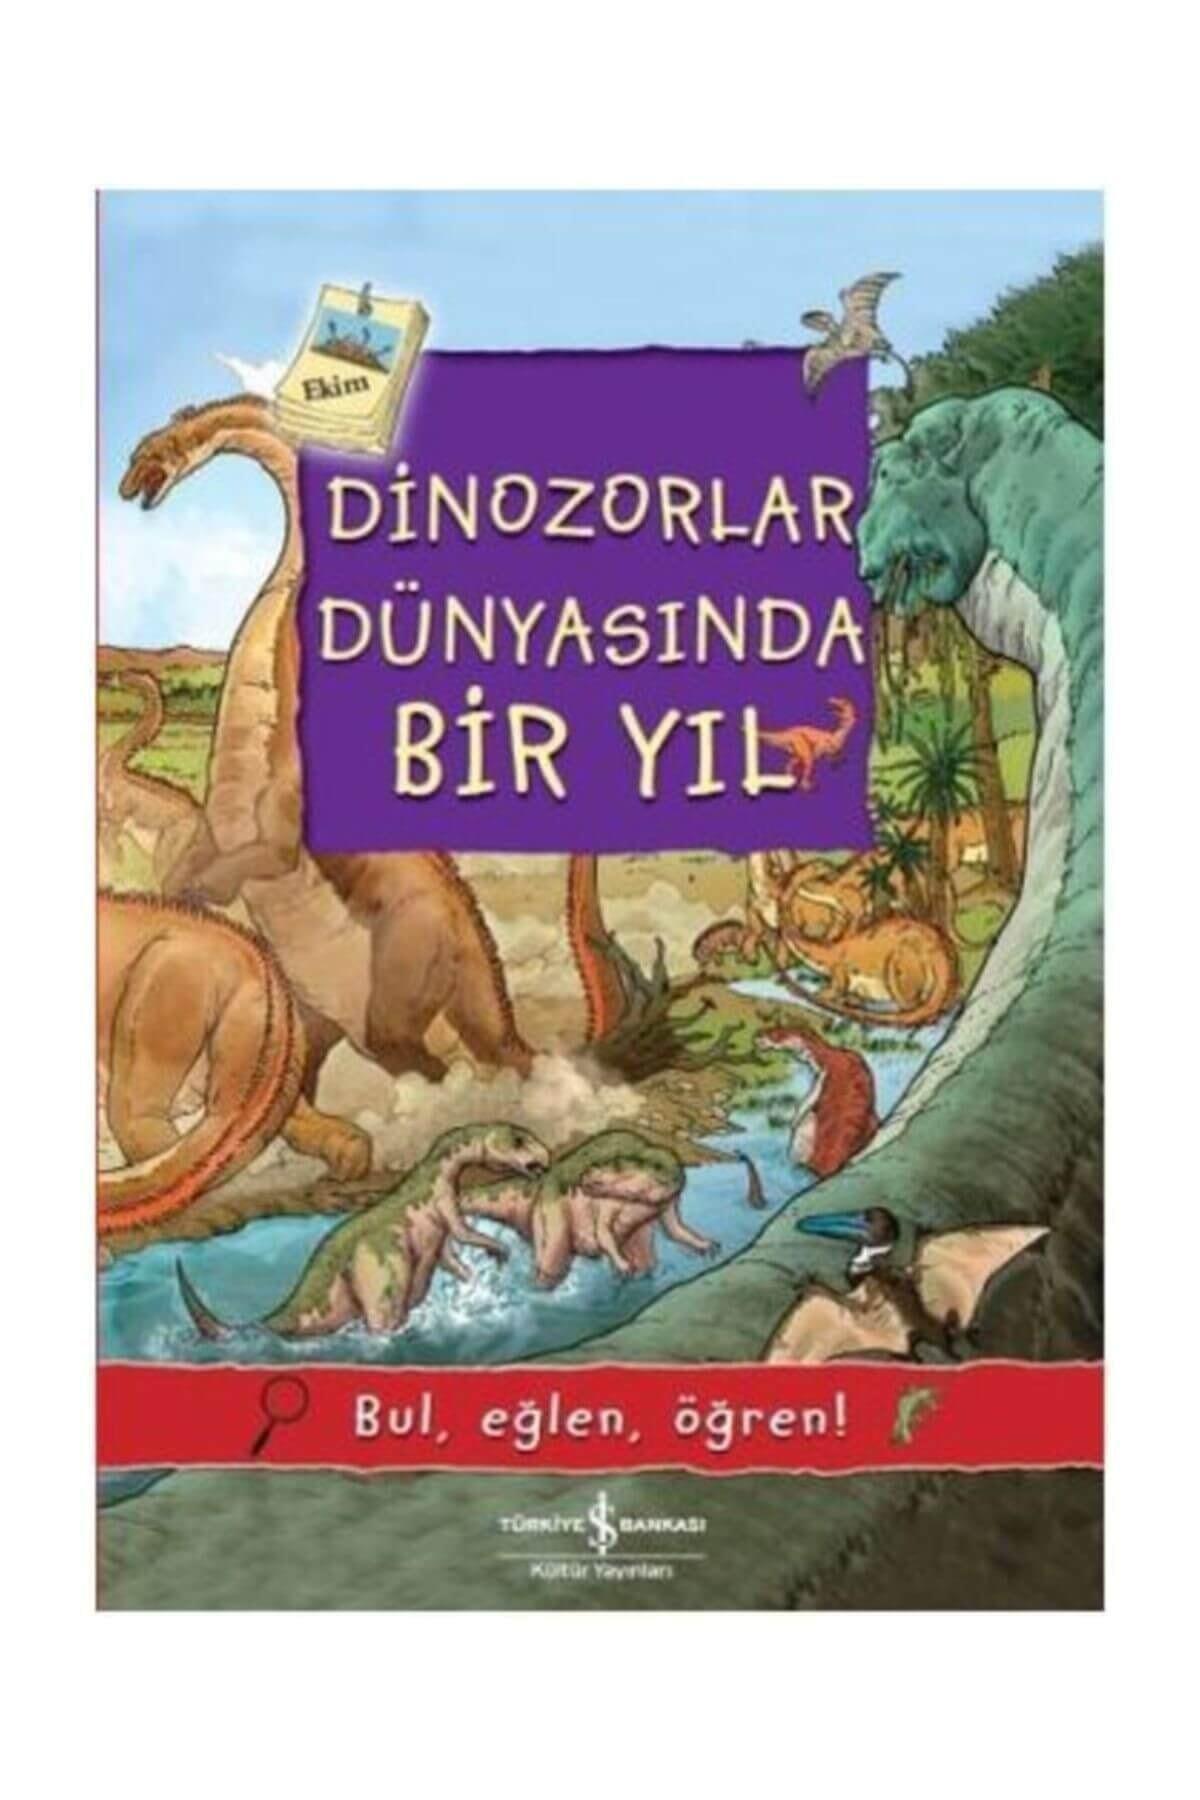 Dinozorlar Dünyasında Bir Yıl Olivia Brookes